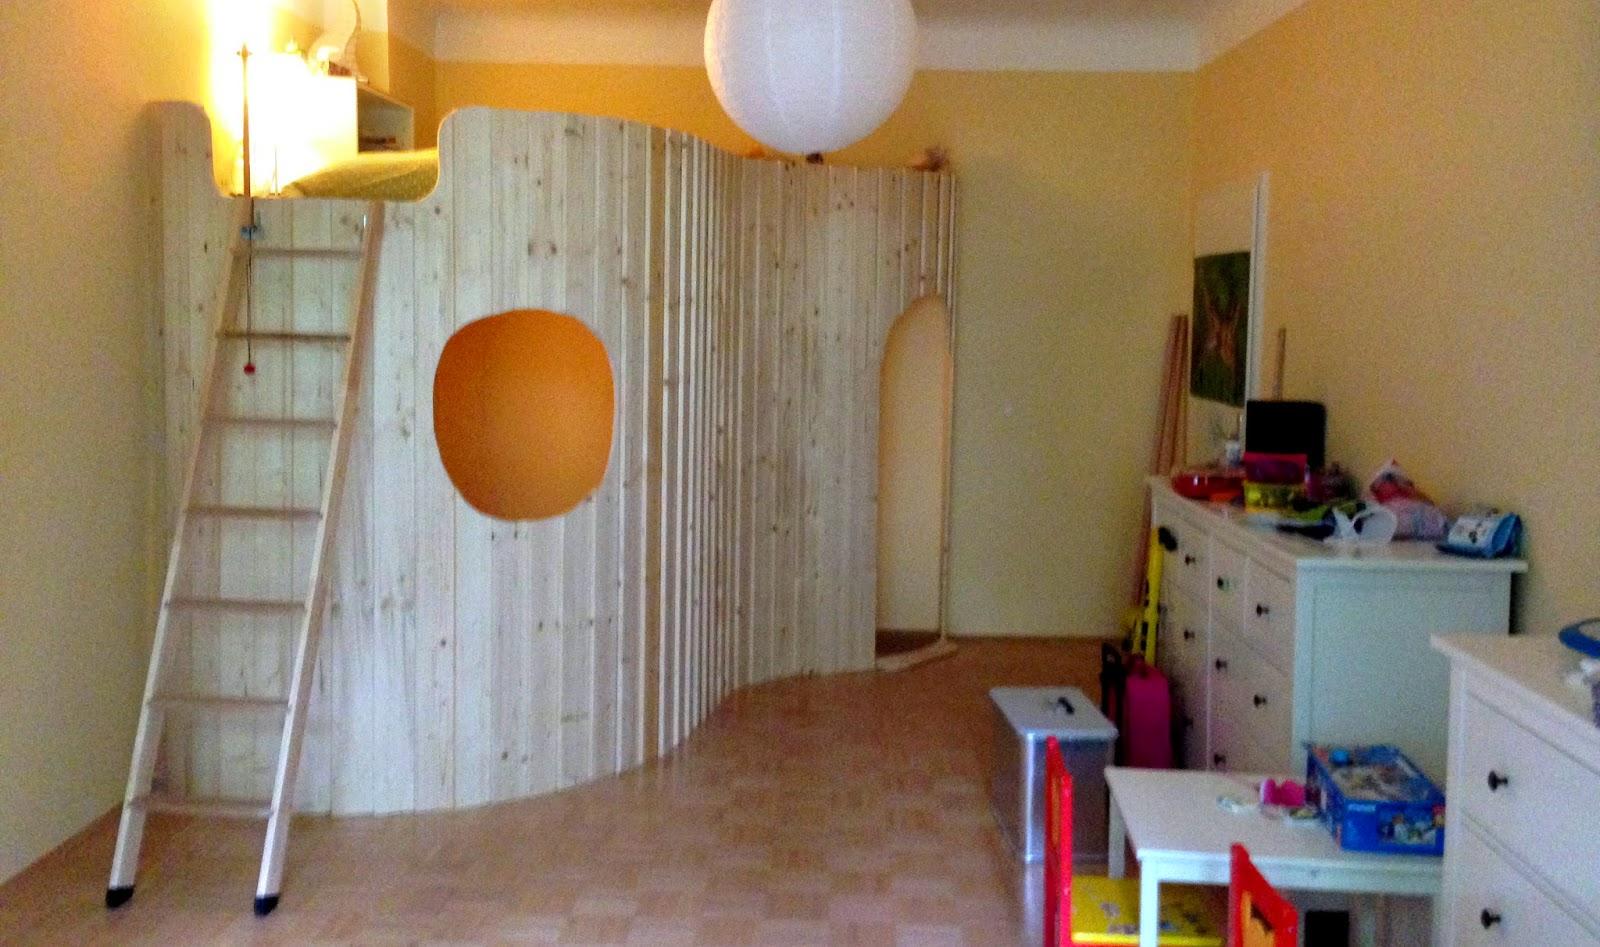 Kinder podestbett – sehremini